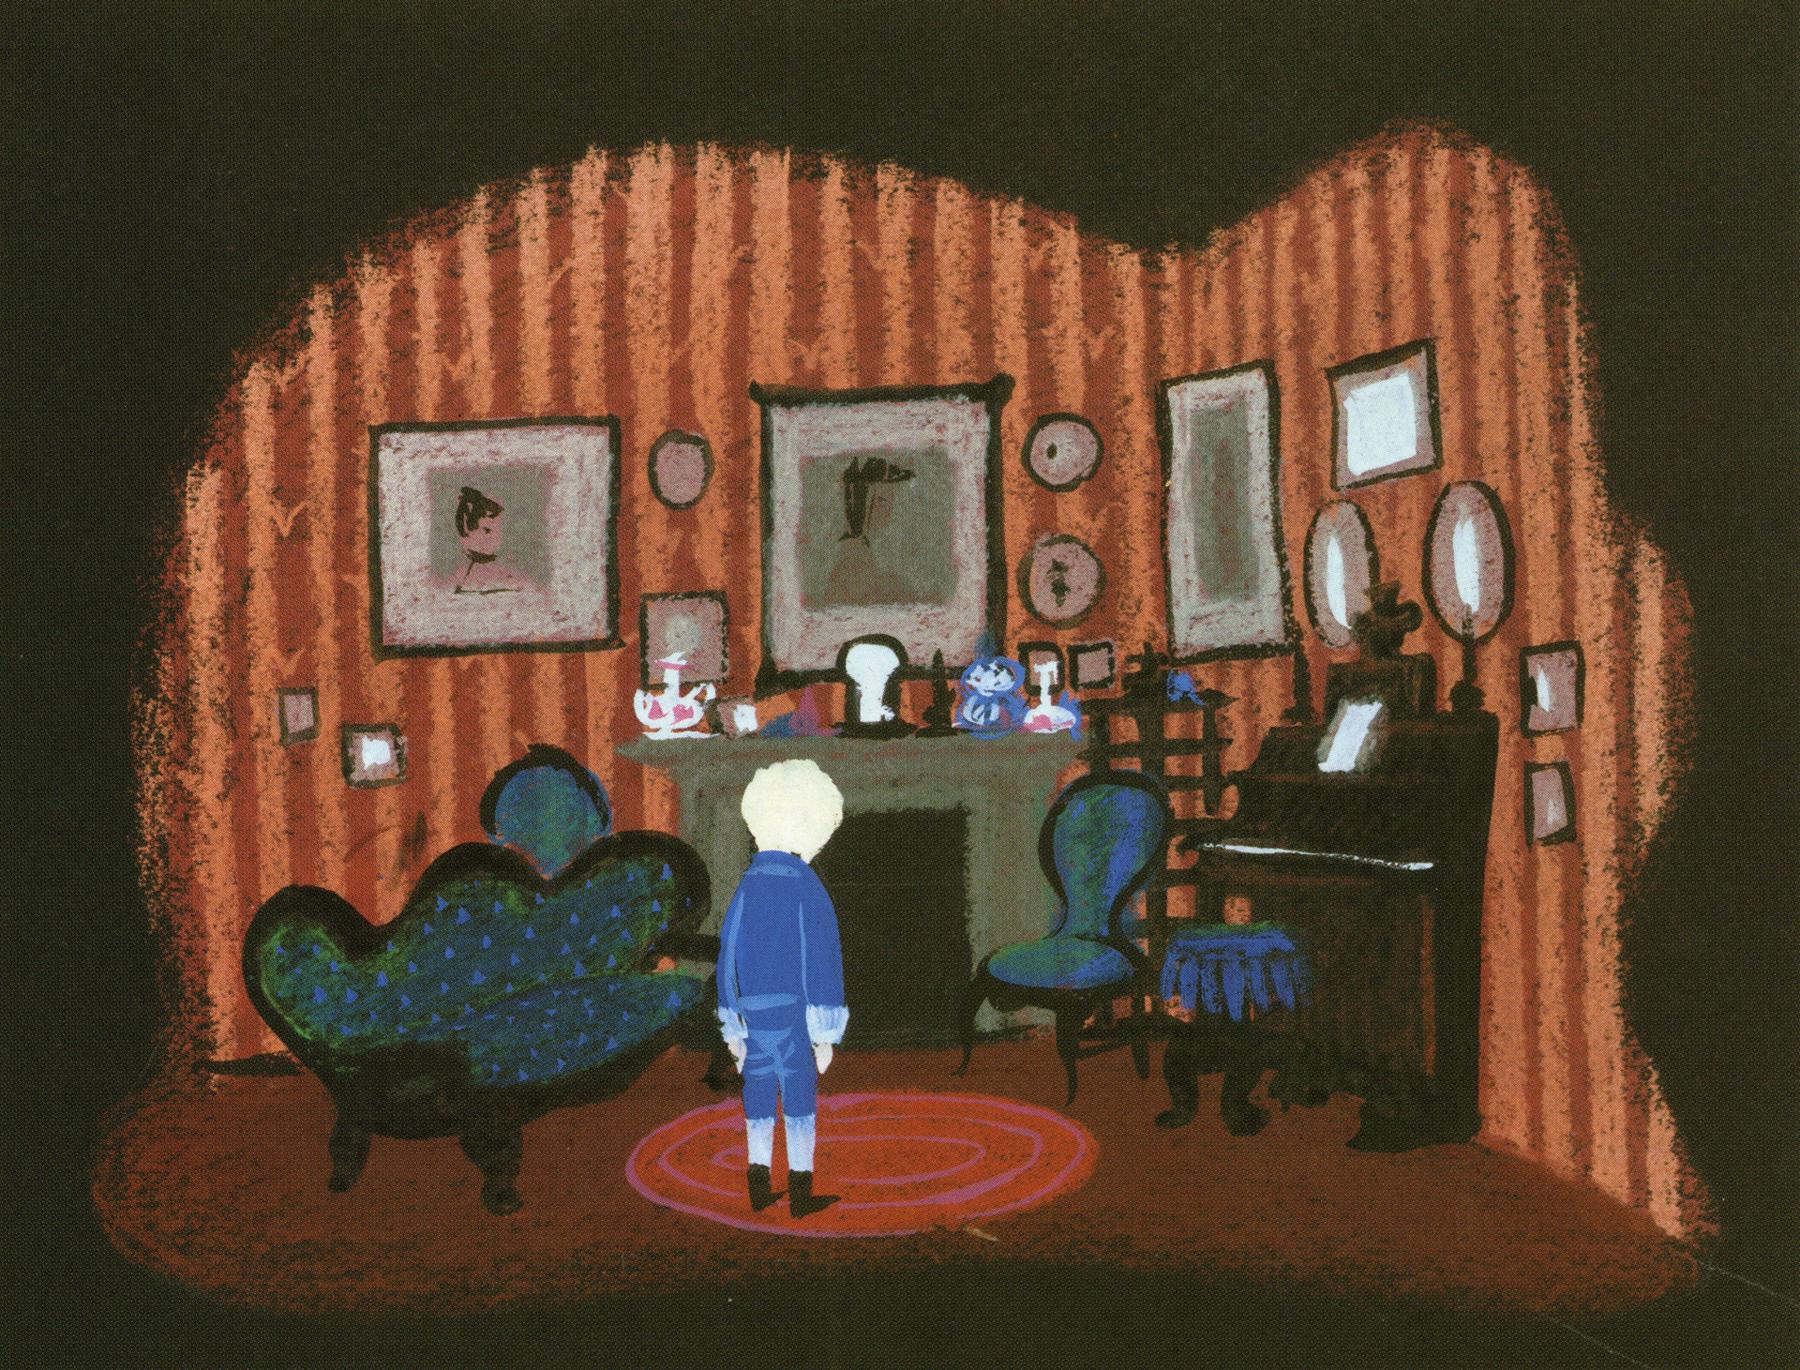 Mary Blair, an other artist I admire